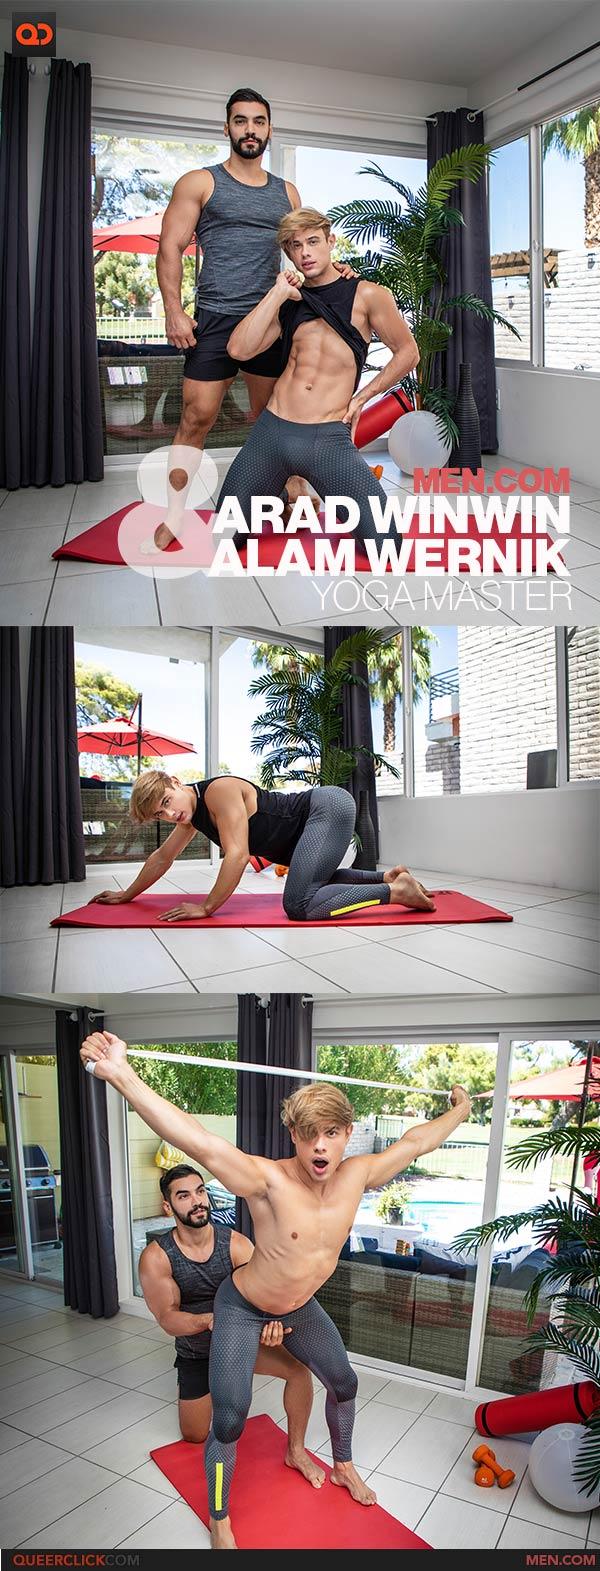 Men.com: Alam Wernik and Arad Winwin